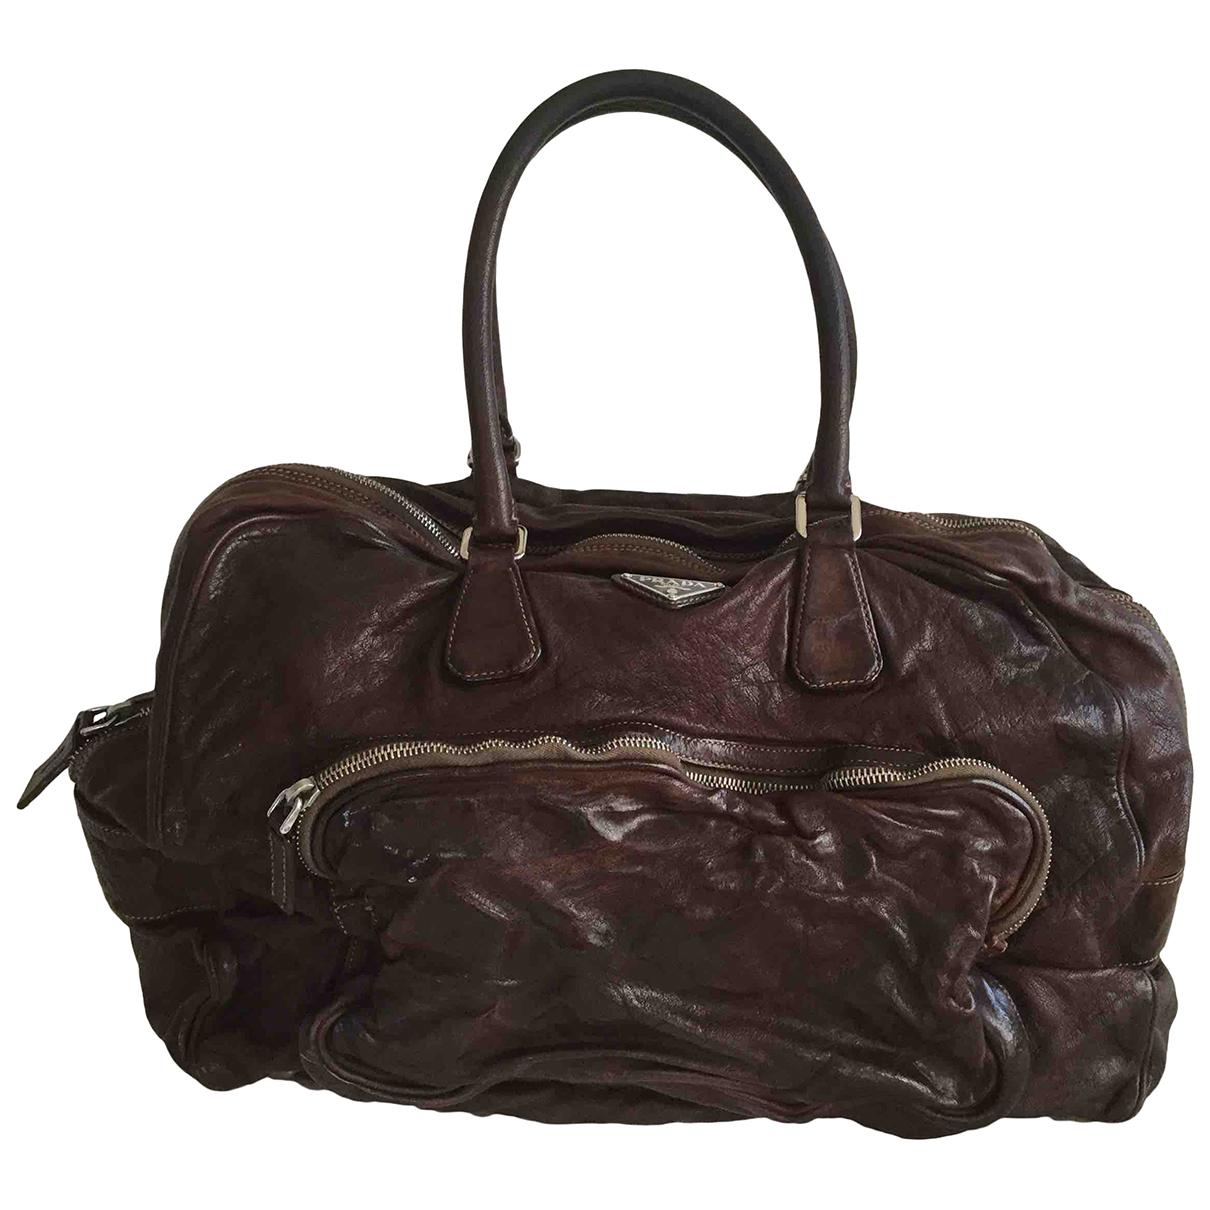 Prada N Brown Leather Travel bag for Women N